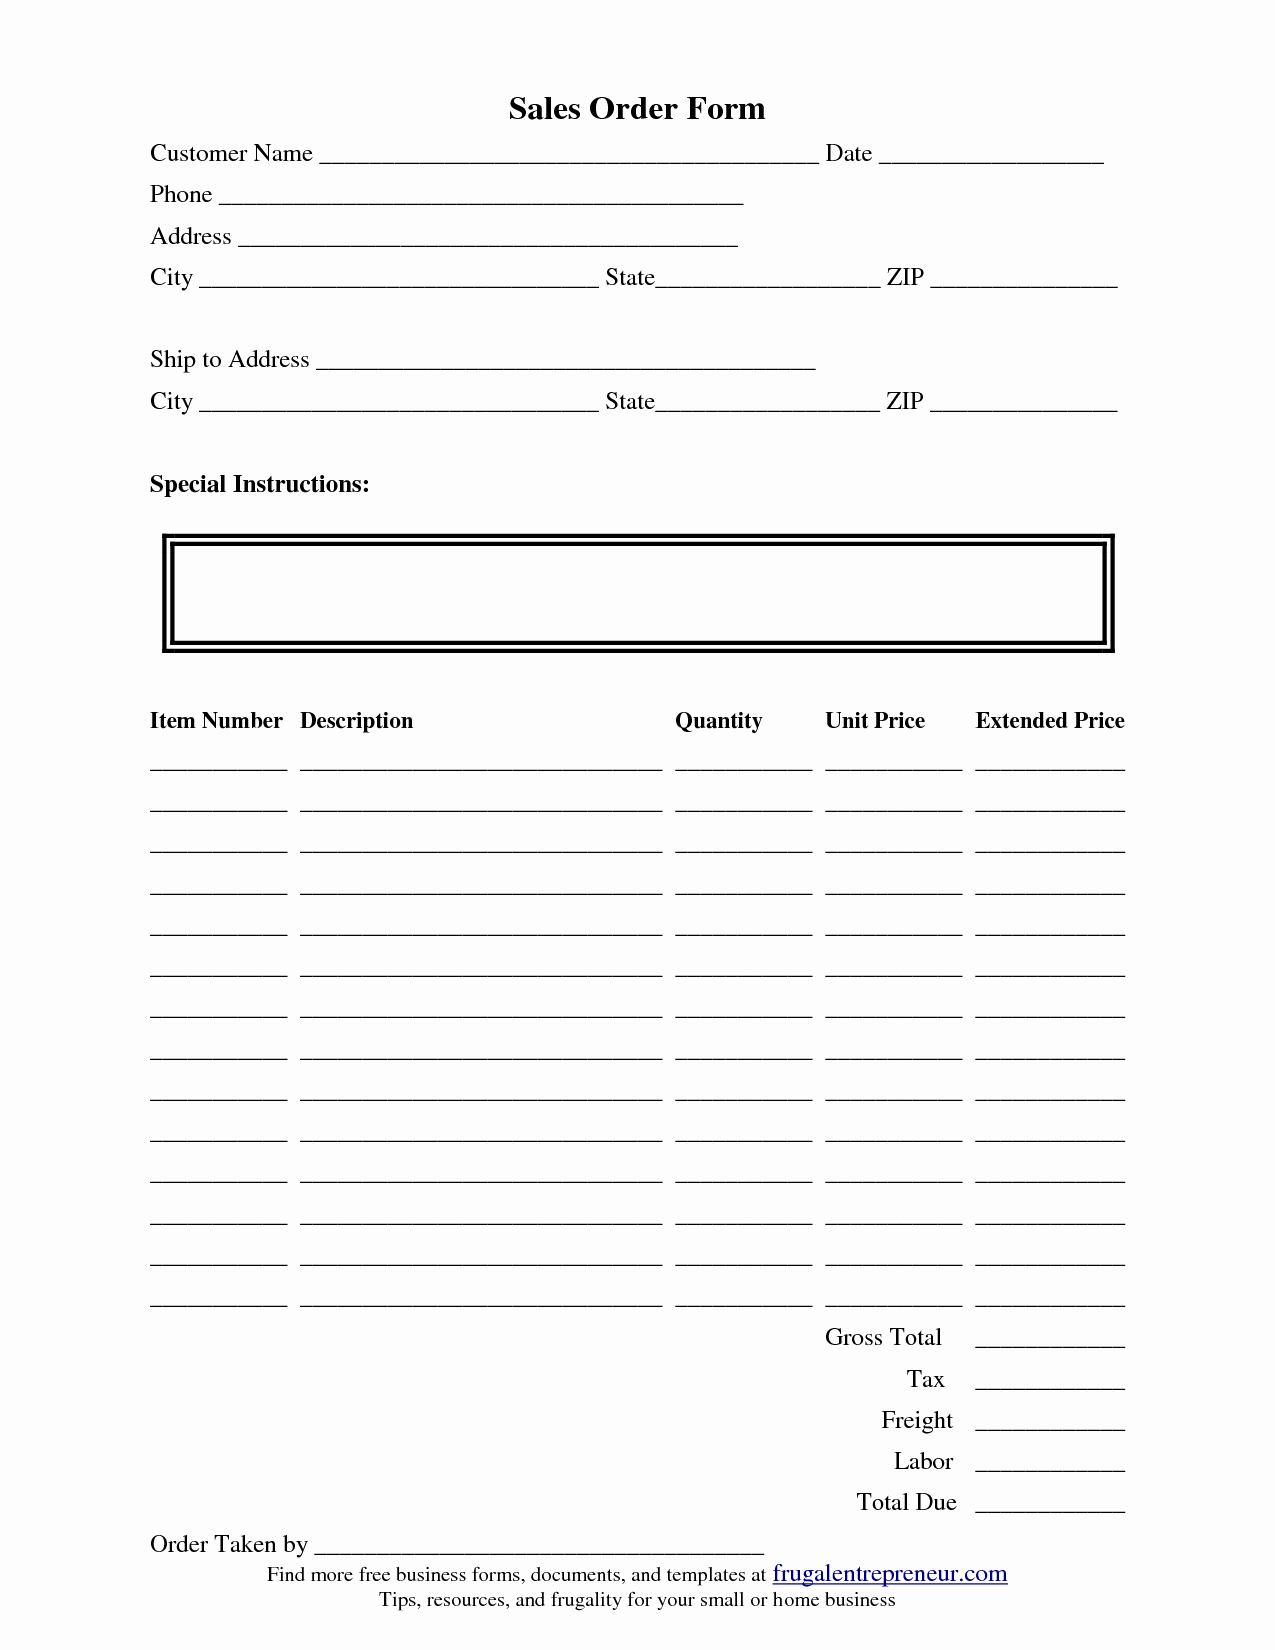 Blank order form Template Word Elegant order form Template